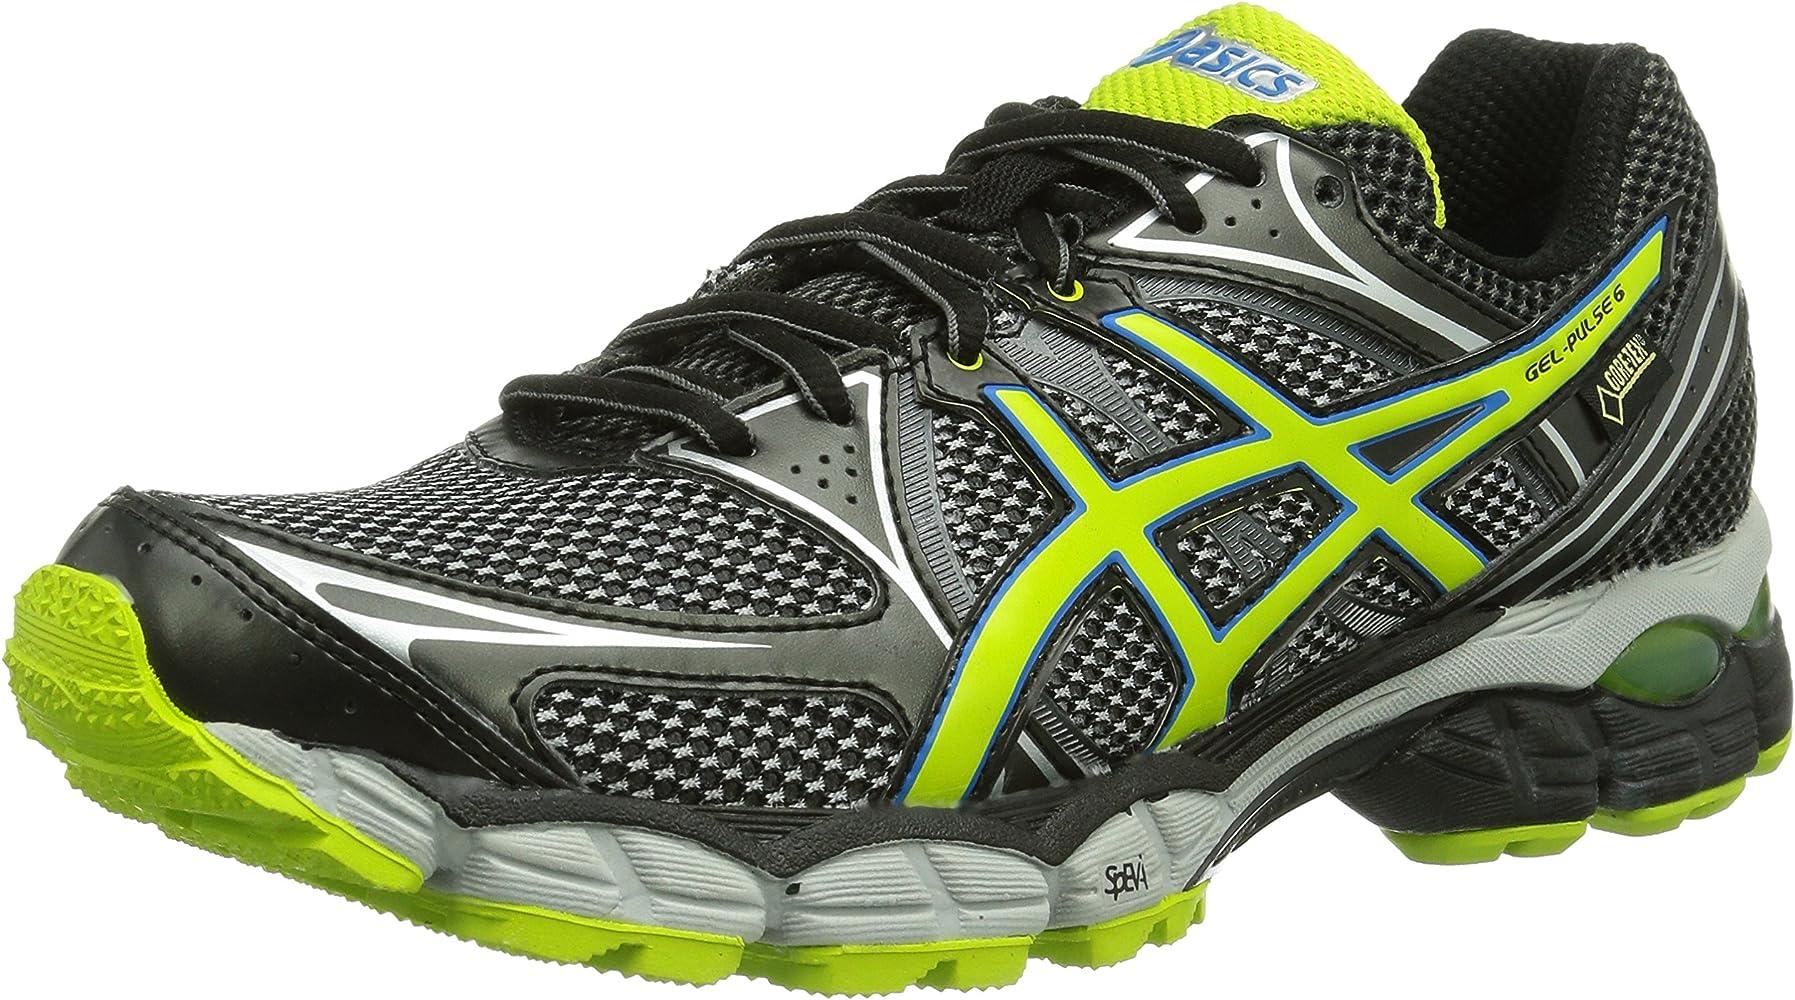 Asics Gel Pulse 6 G-TX - Zapatillas de Running para Hombre, Color ...